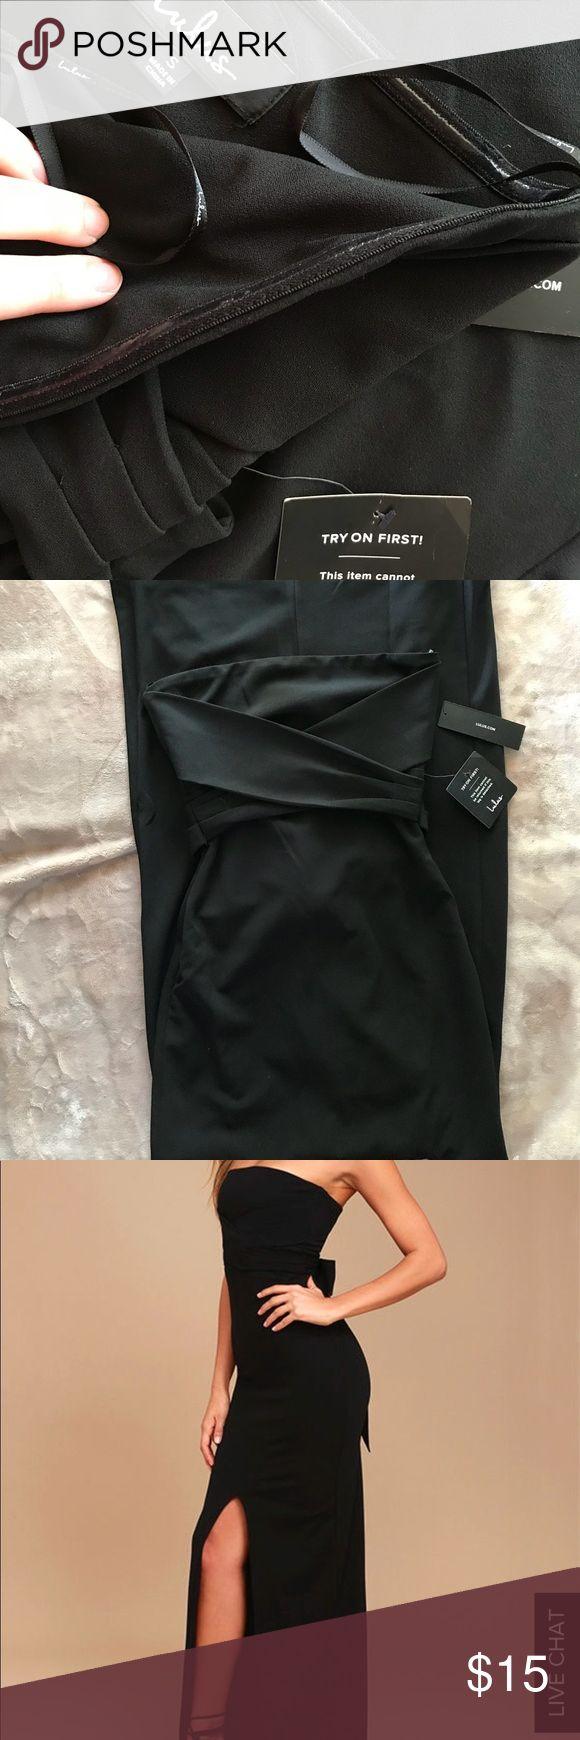 NWT lulu black maxi strapless dress w/slit Brand new. Long black maxi dress. Strapless. Front slit. Tie back. Lulu's Dresses Strapless